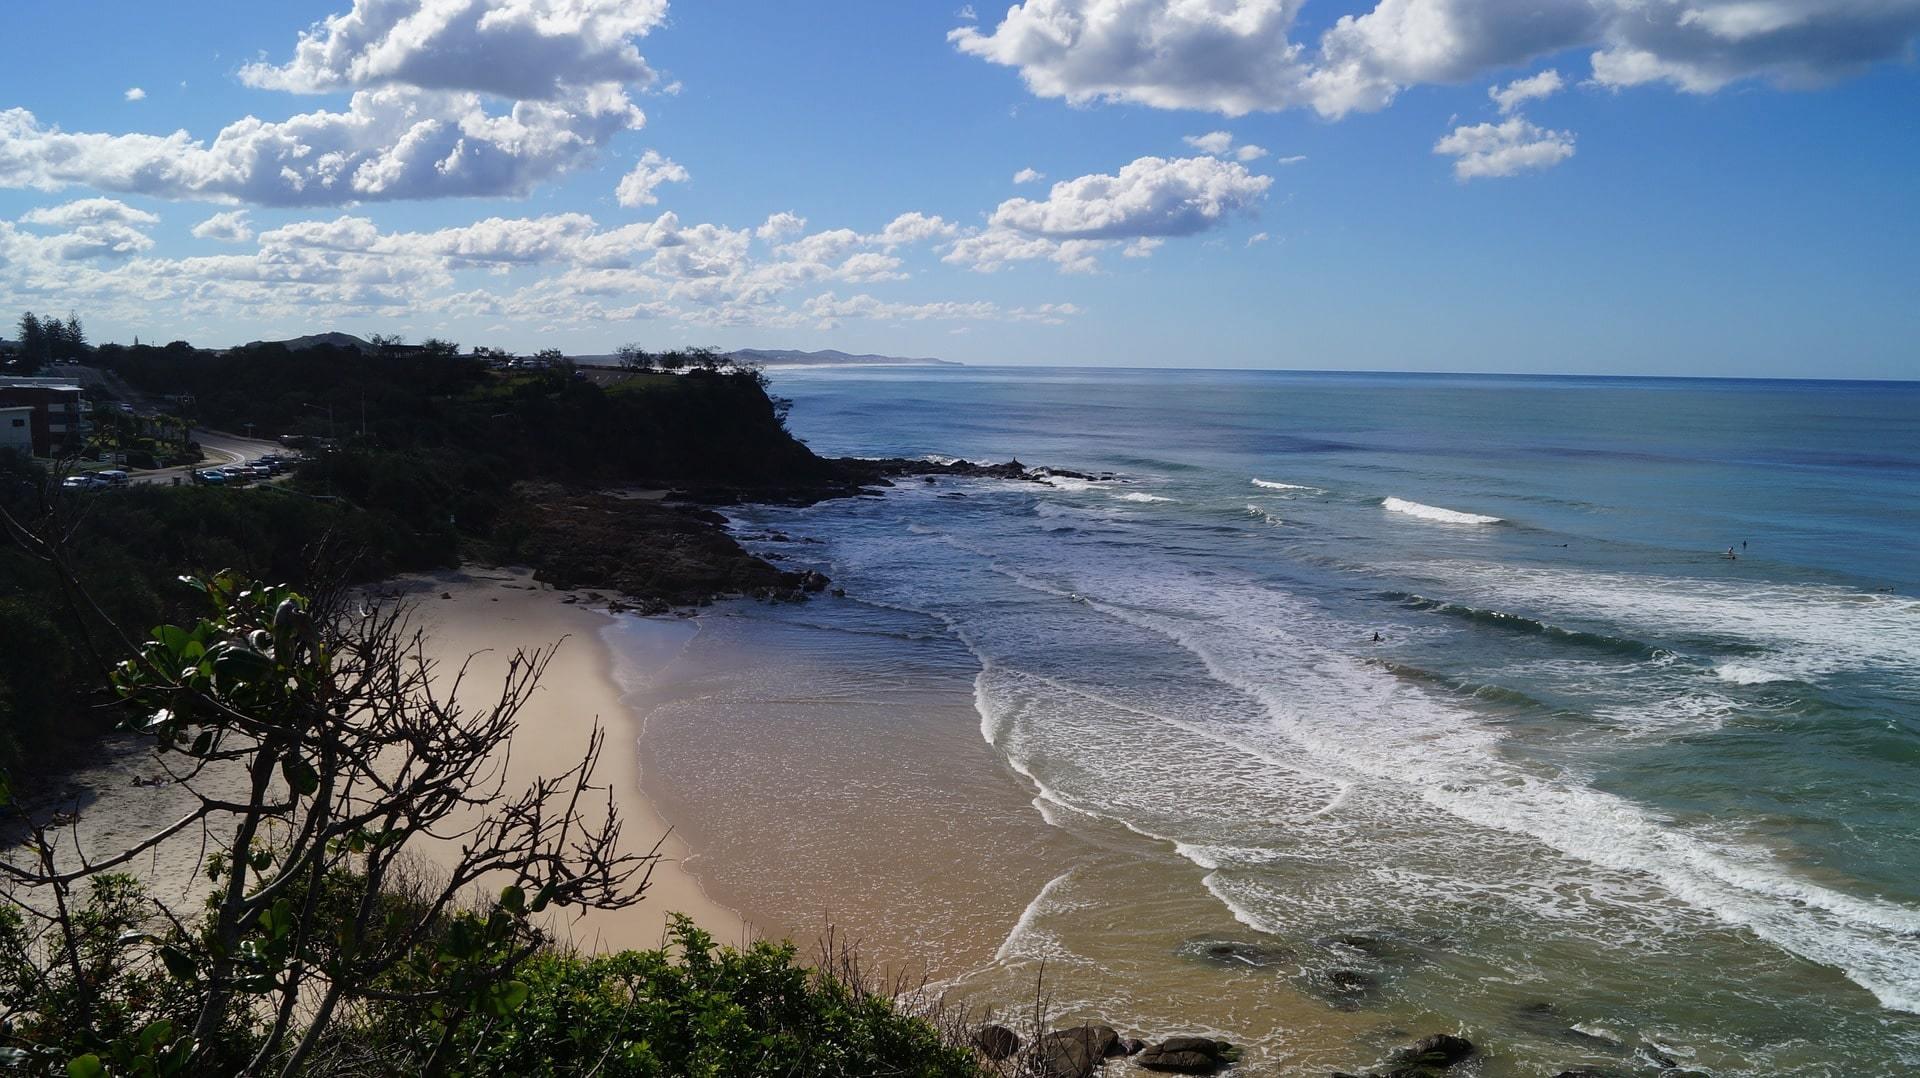 backpacking australia east coast itinerary